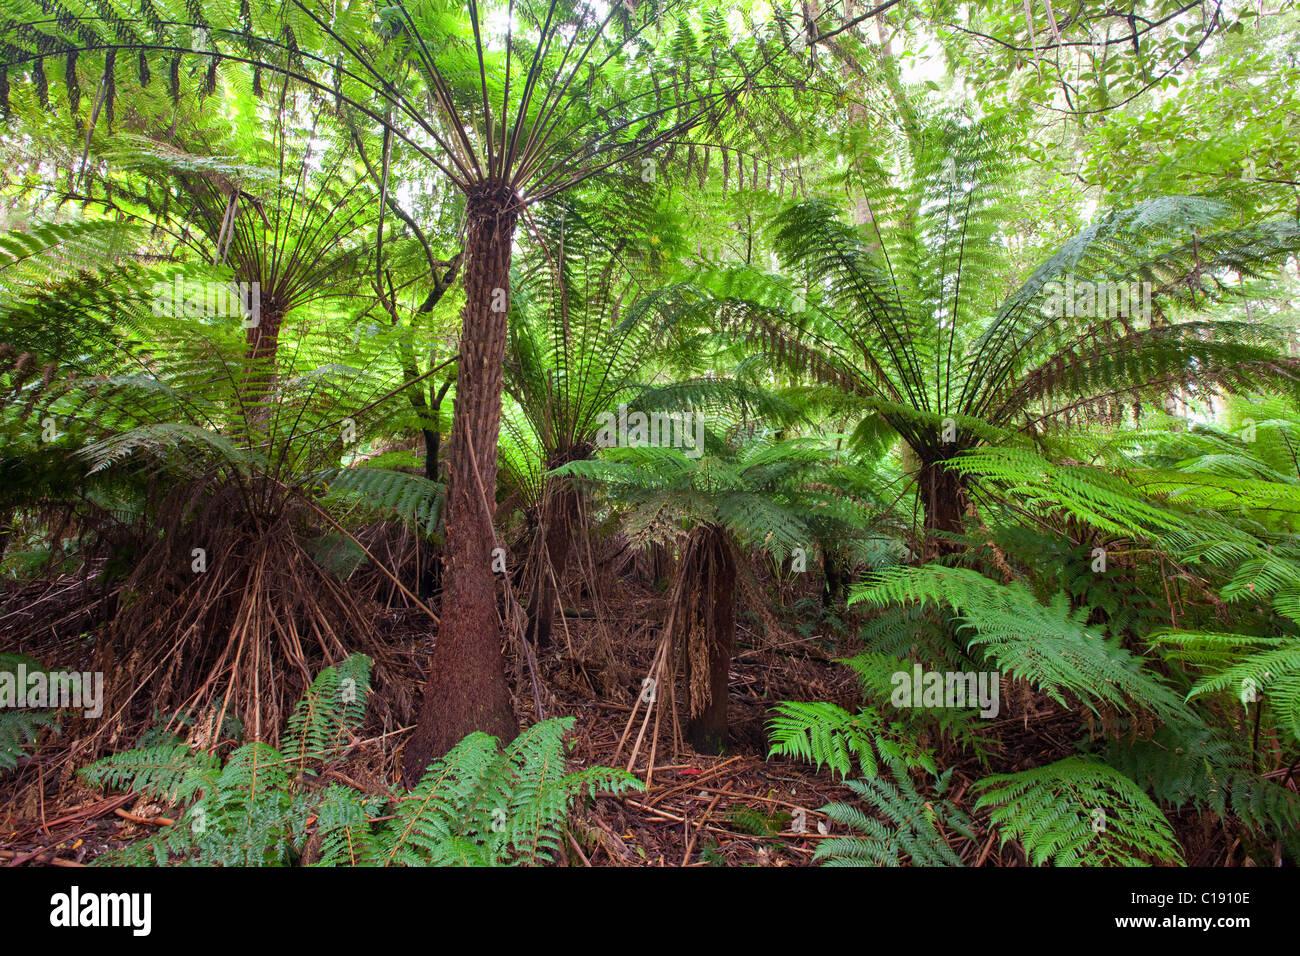 temperate rainforest, Great Otway National Park, Victoria, Australia - Stock Image